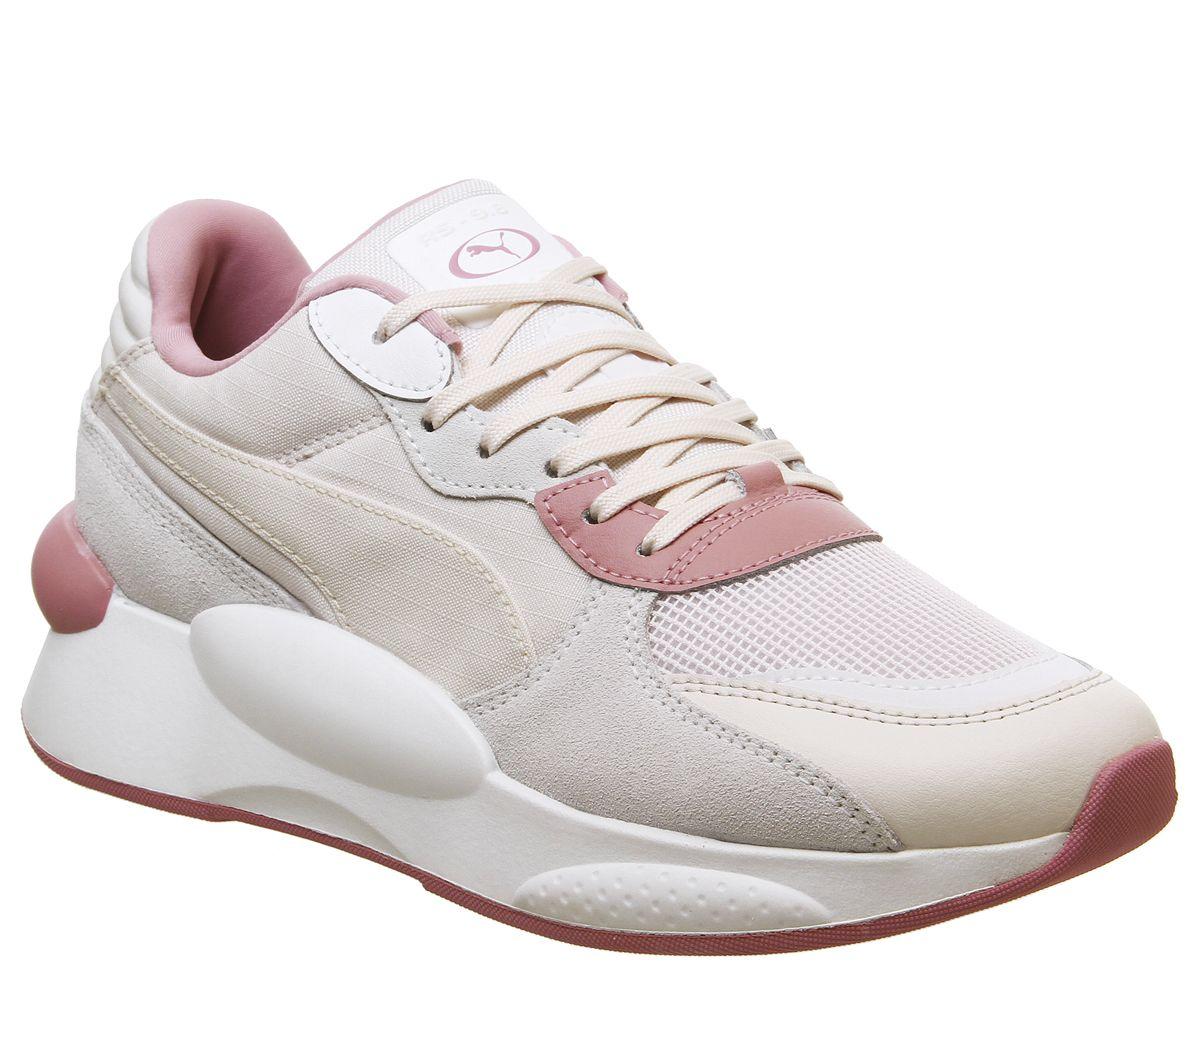 Zu 8 Turnschuhe Weiß Pastell Details Raum Pergament 9 Damen Rs Puma PX8nOk0w